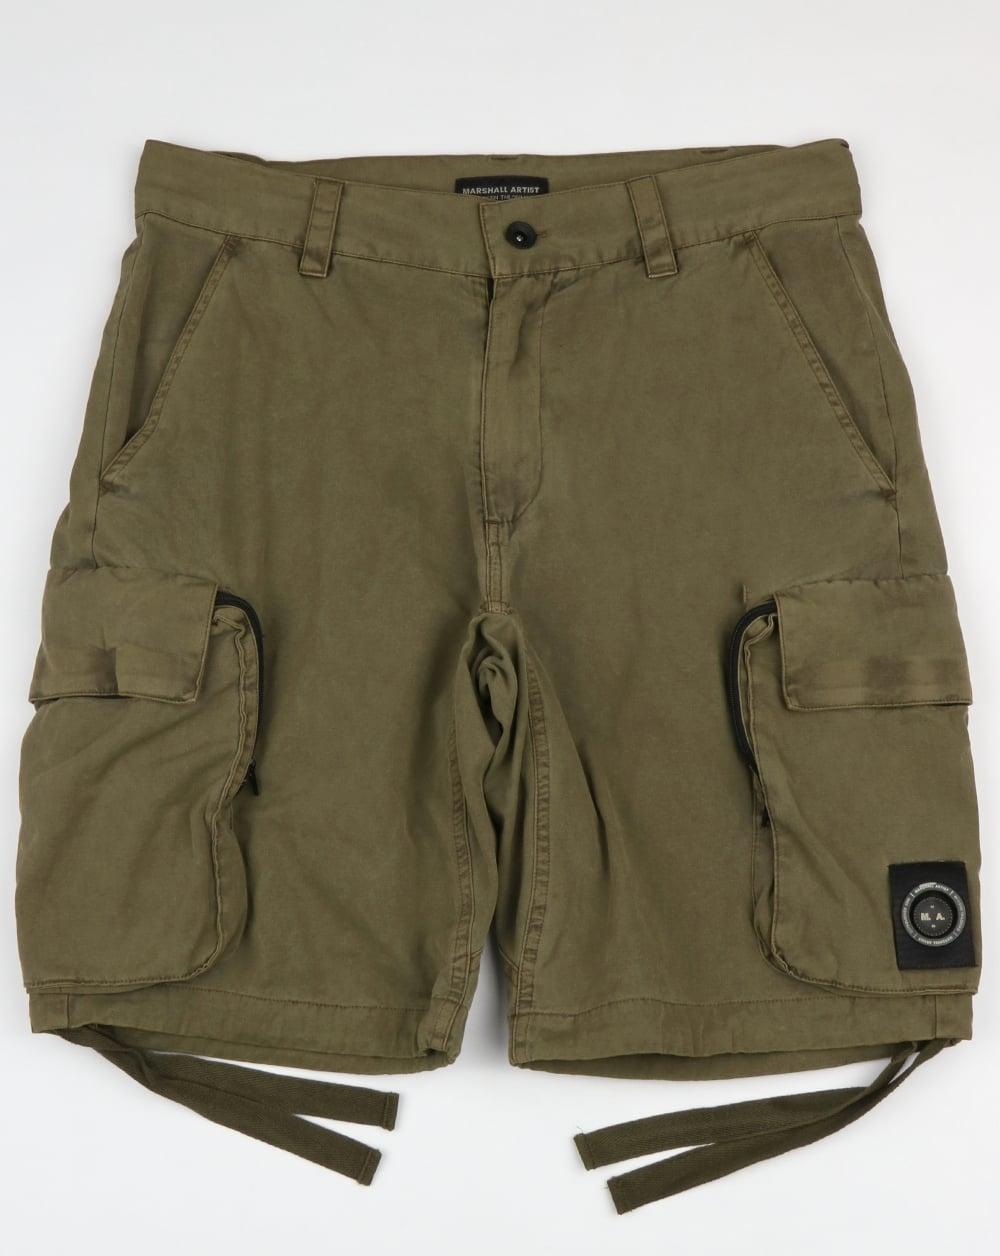 c582335f72 Marshall Artist Marshall Artist Garment Dyed Combat Cargo Shorts Khaki